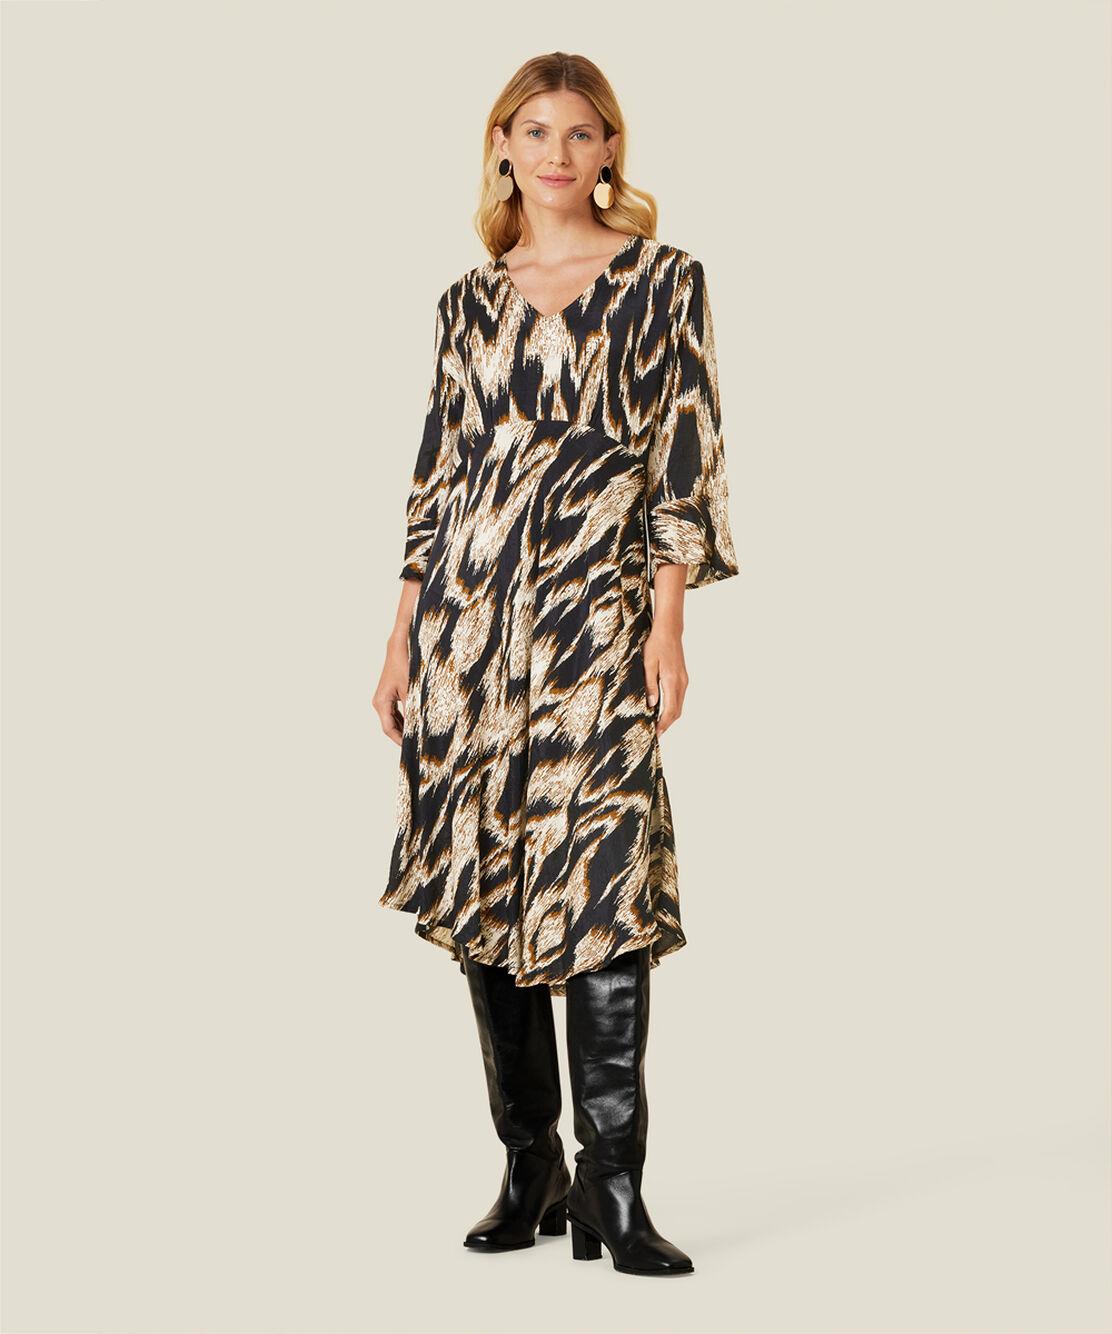 NITA DRESS, Monk's Robe, hi-res